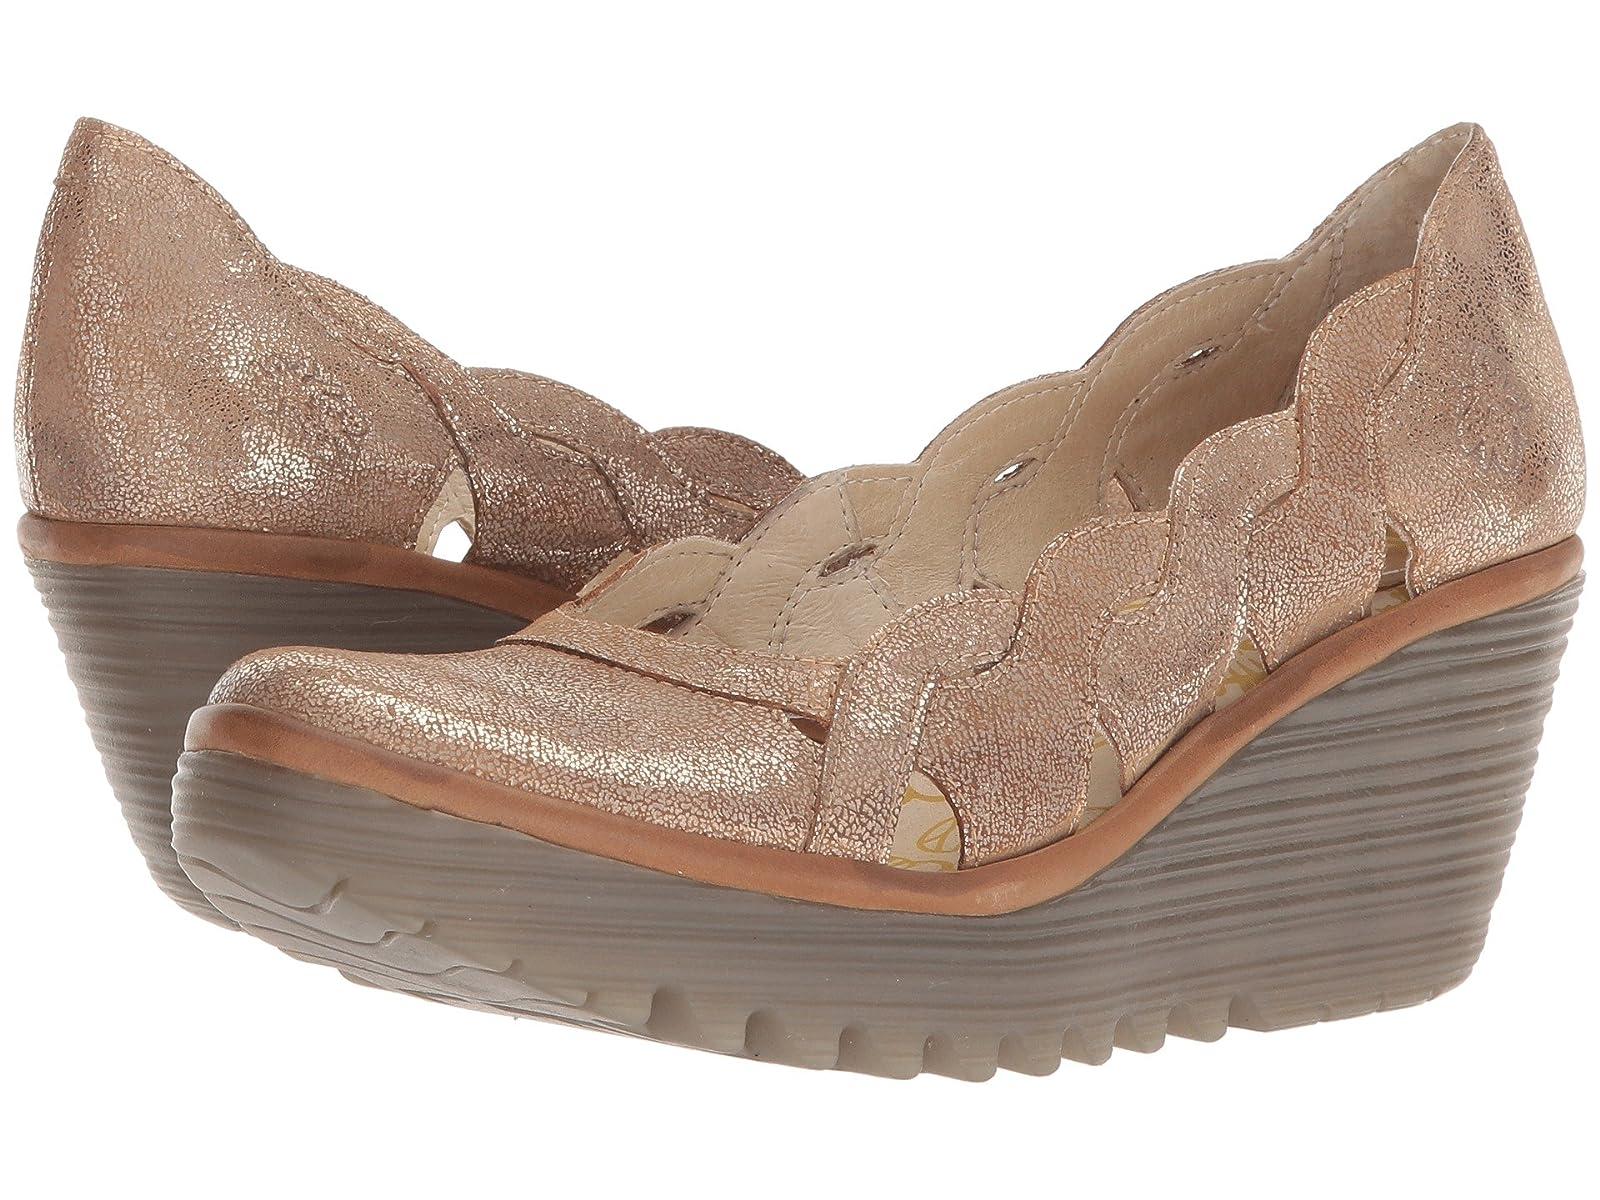 FLY LONDON YELK835FLYAtmospheric grades have affordable shoes